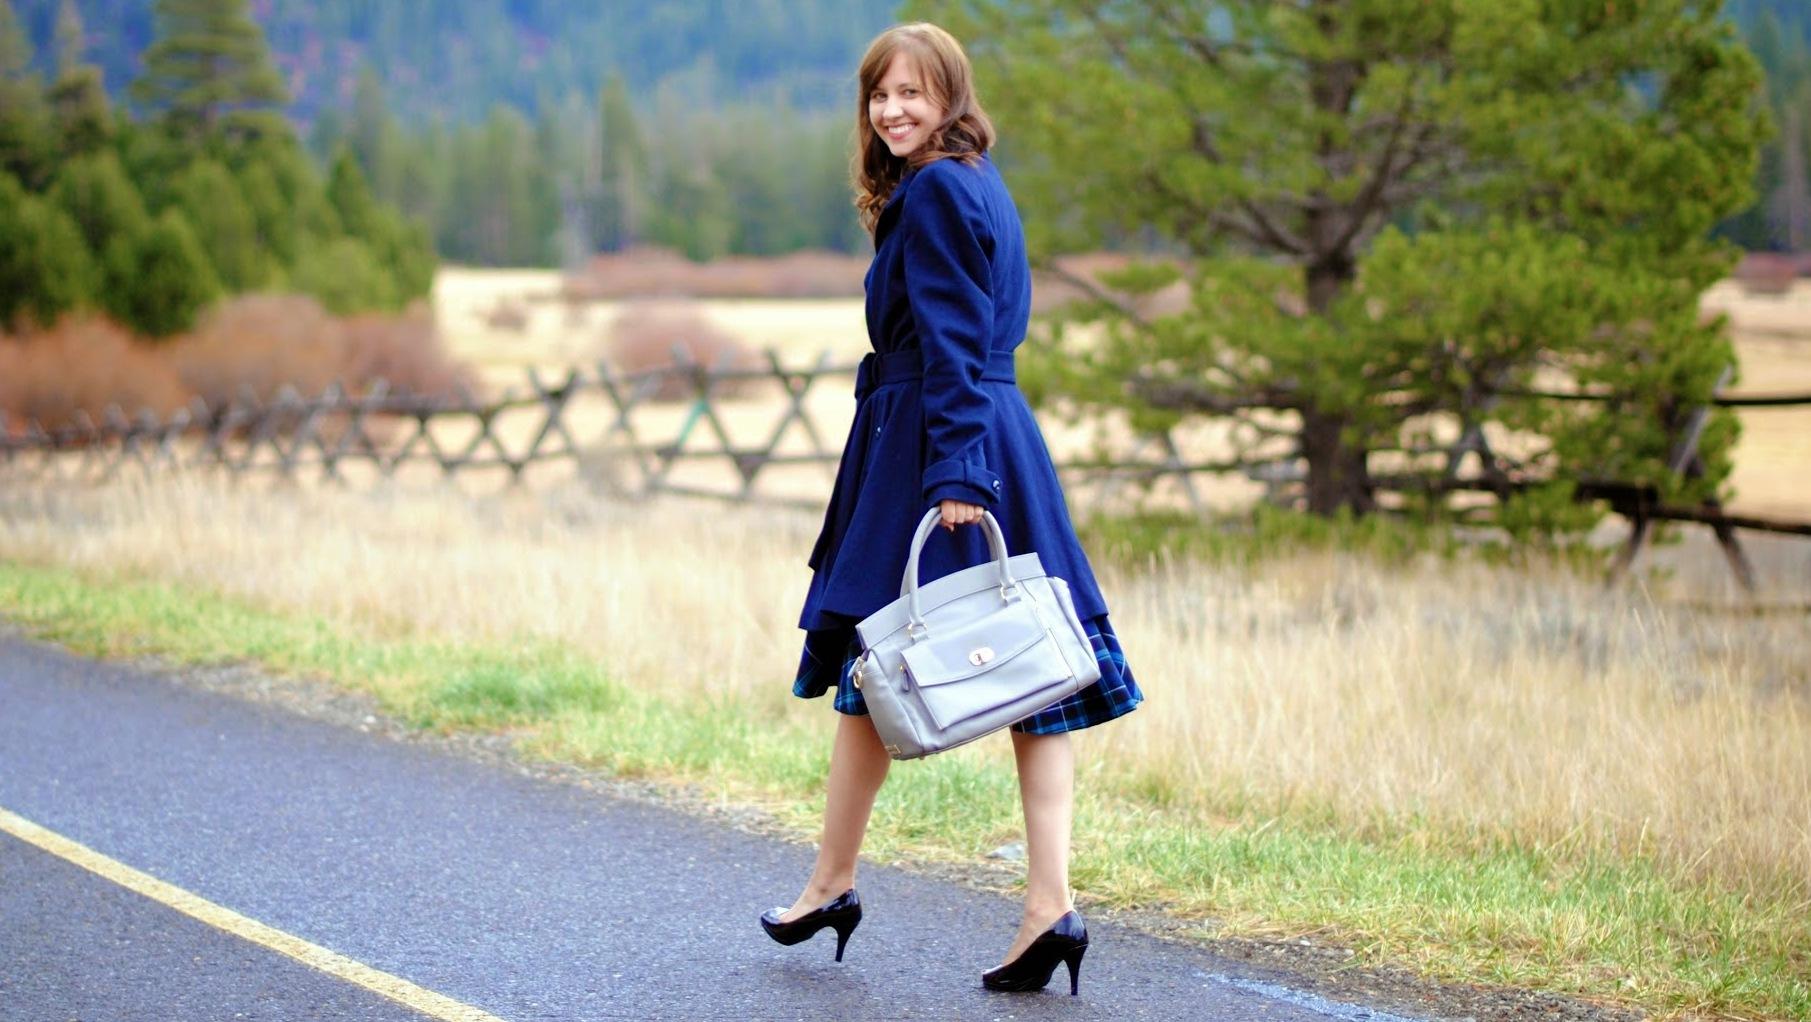 Jordana Paige with her handbag